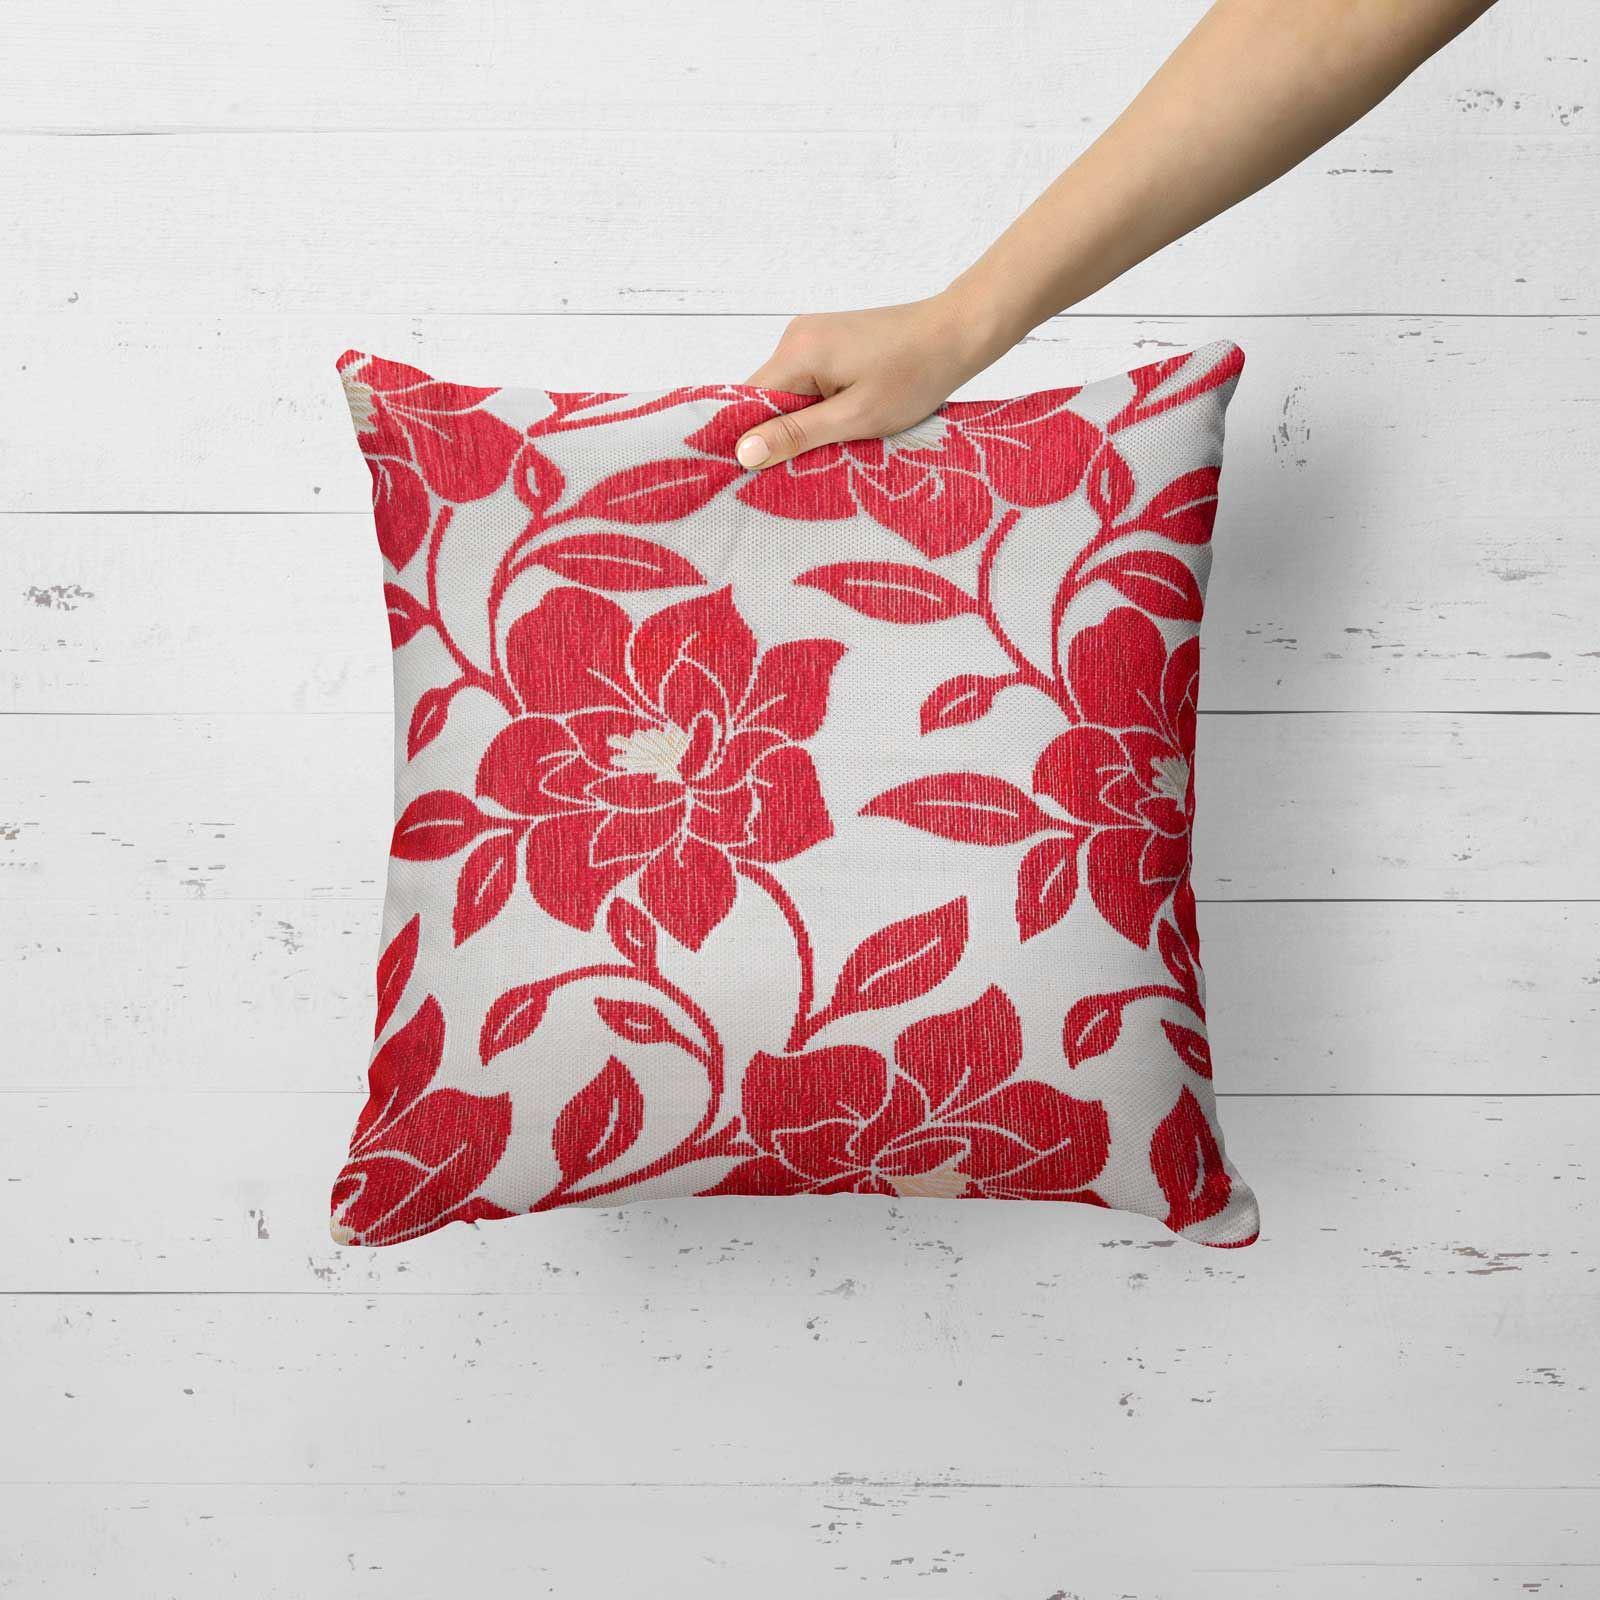 Vino-Tinto-Cushion-Covers-Coleccion-17-034-18-034-43cm-45cm-Cubierta miniatura 53